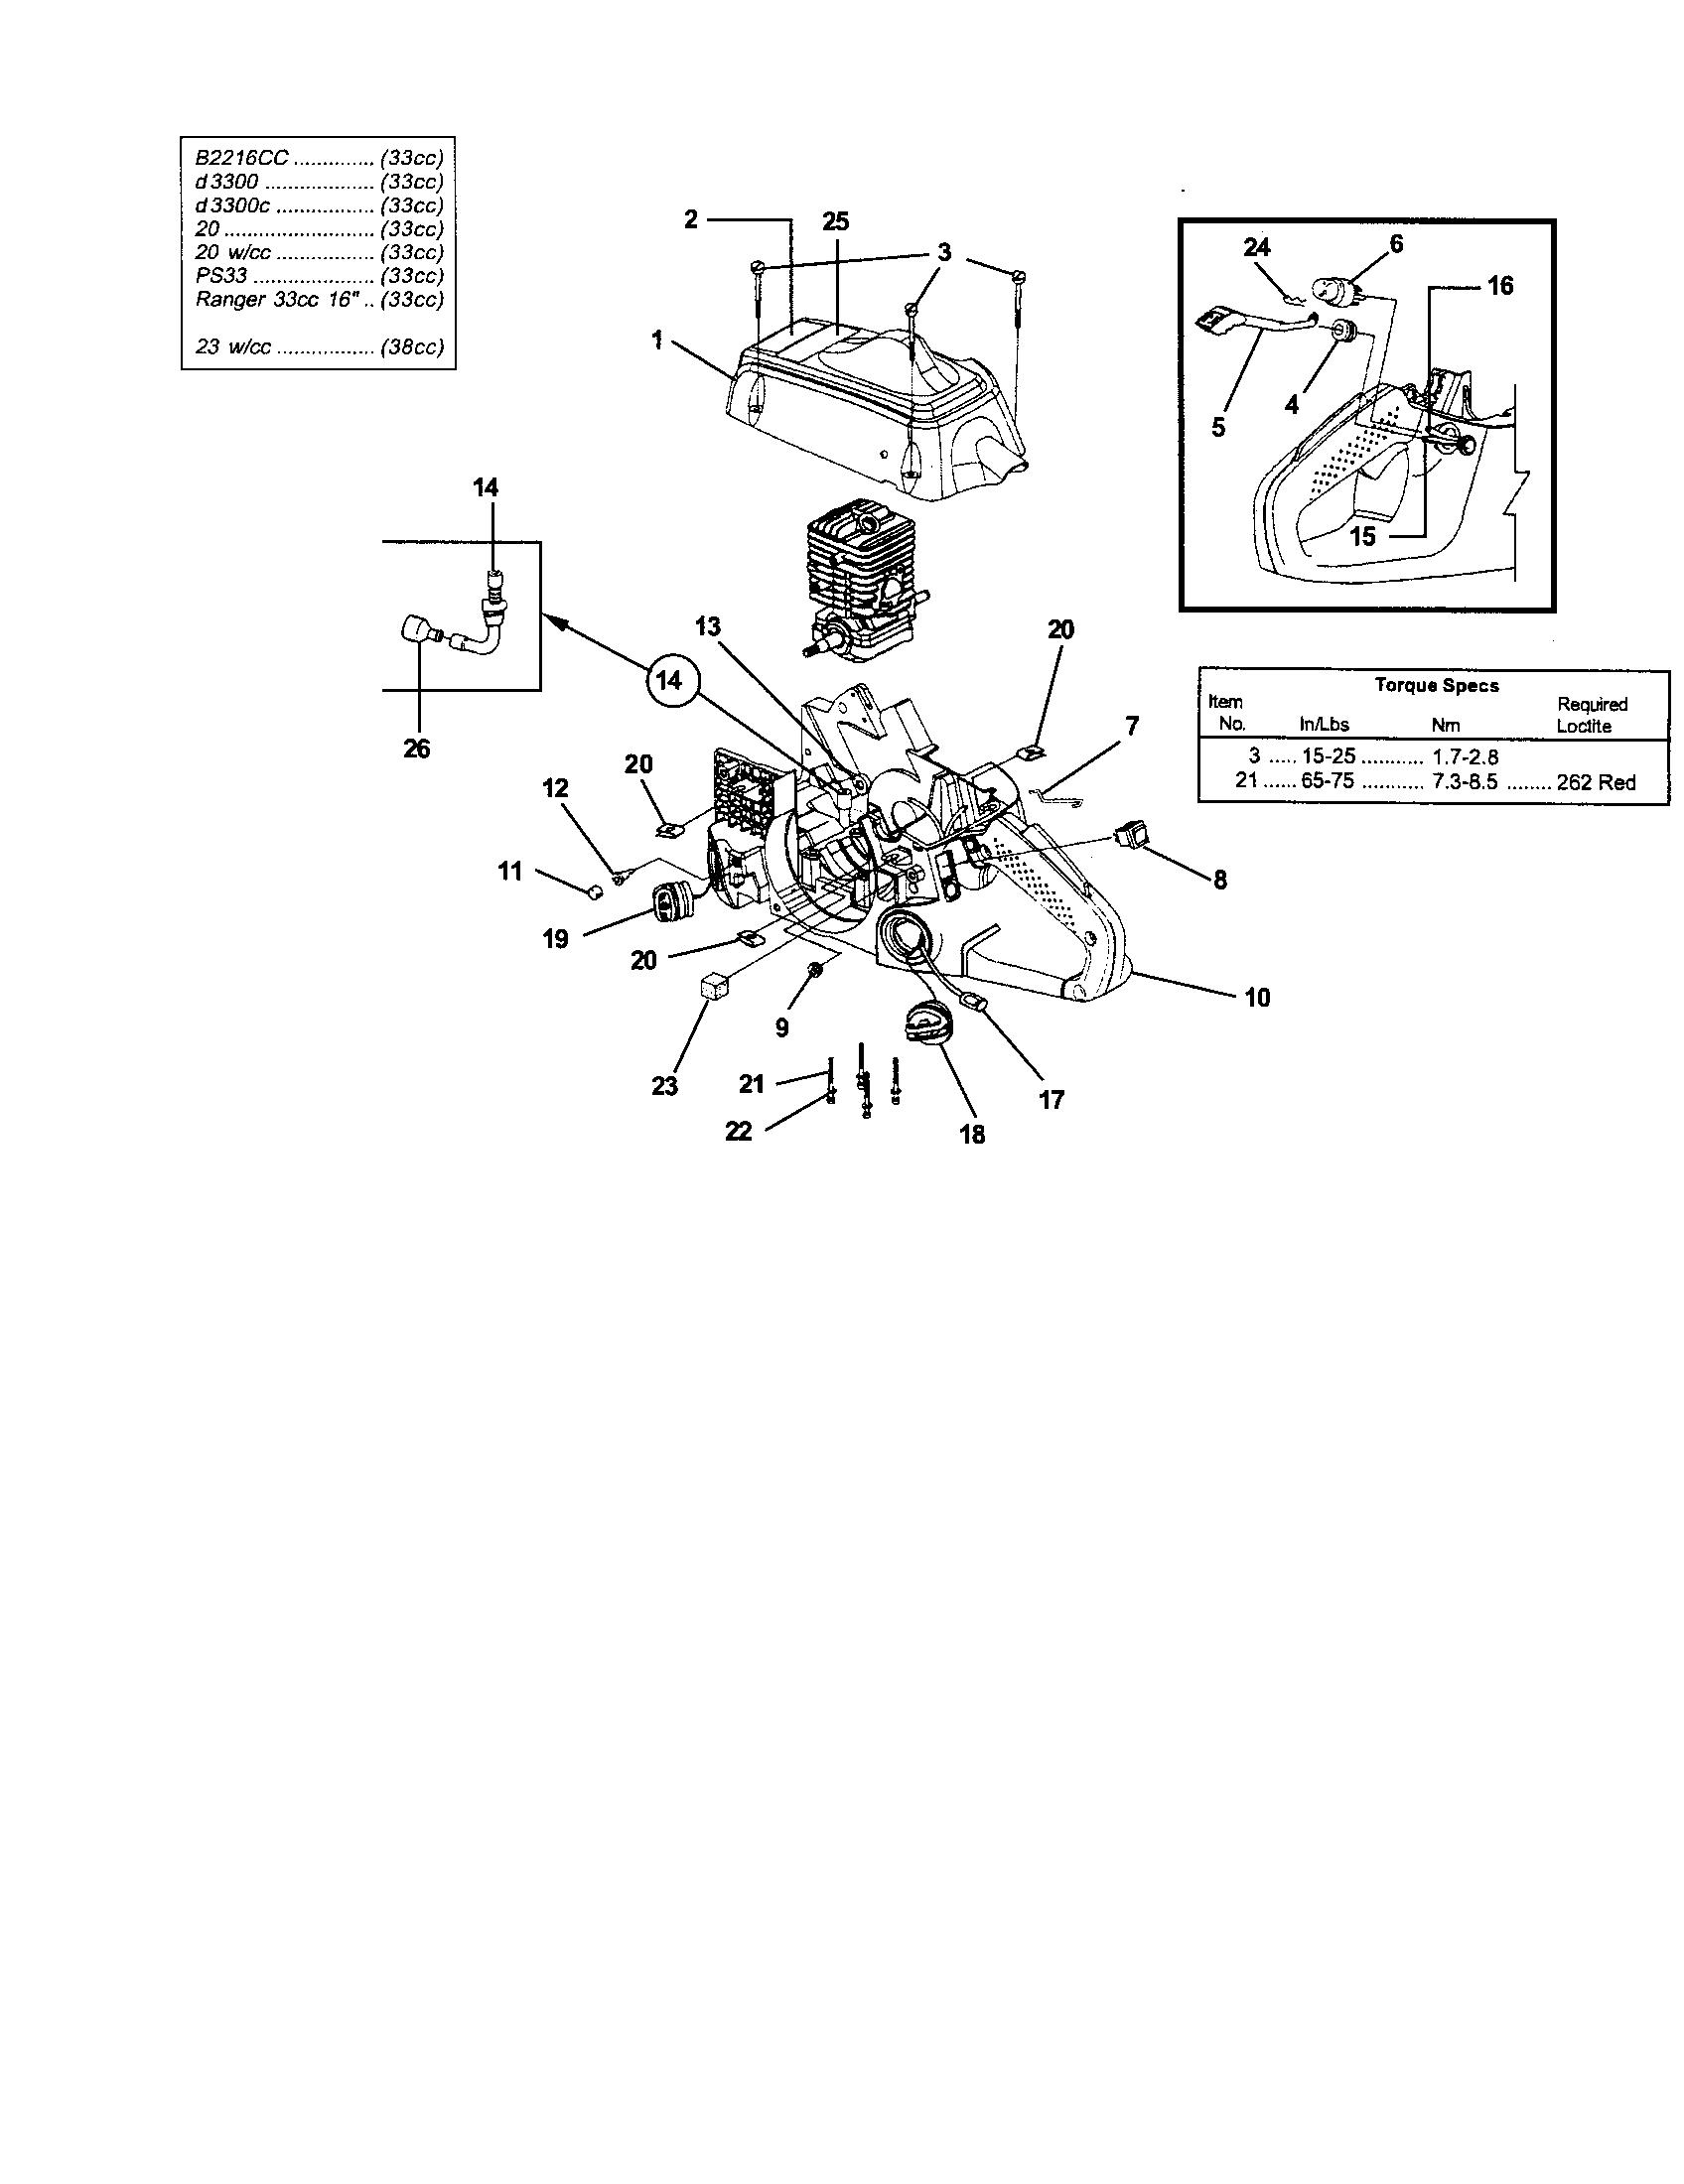 Homelite model UT10847 chainsaw, gas genuine parts